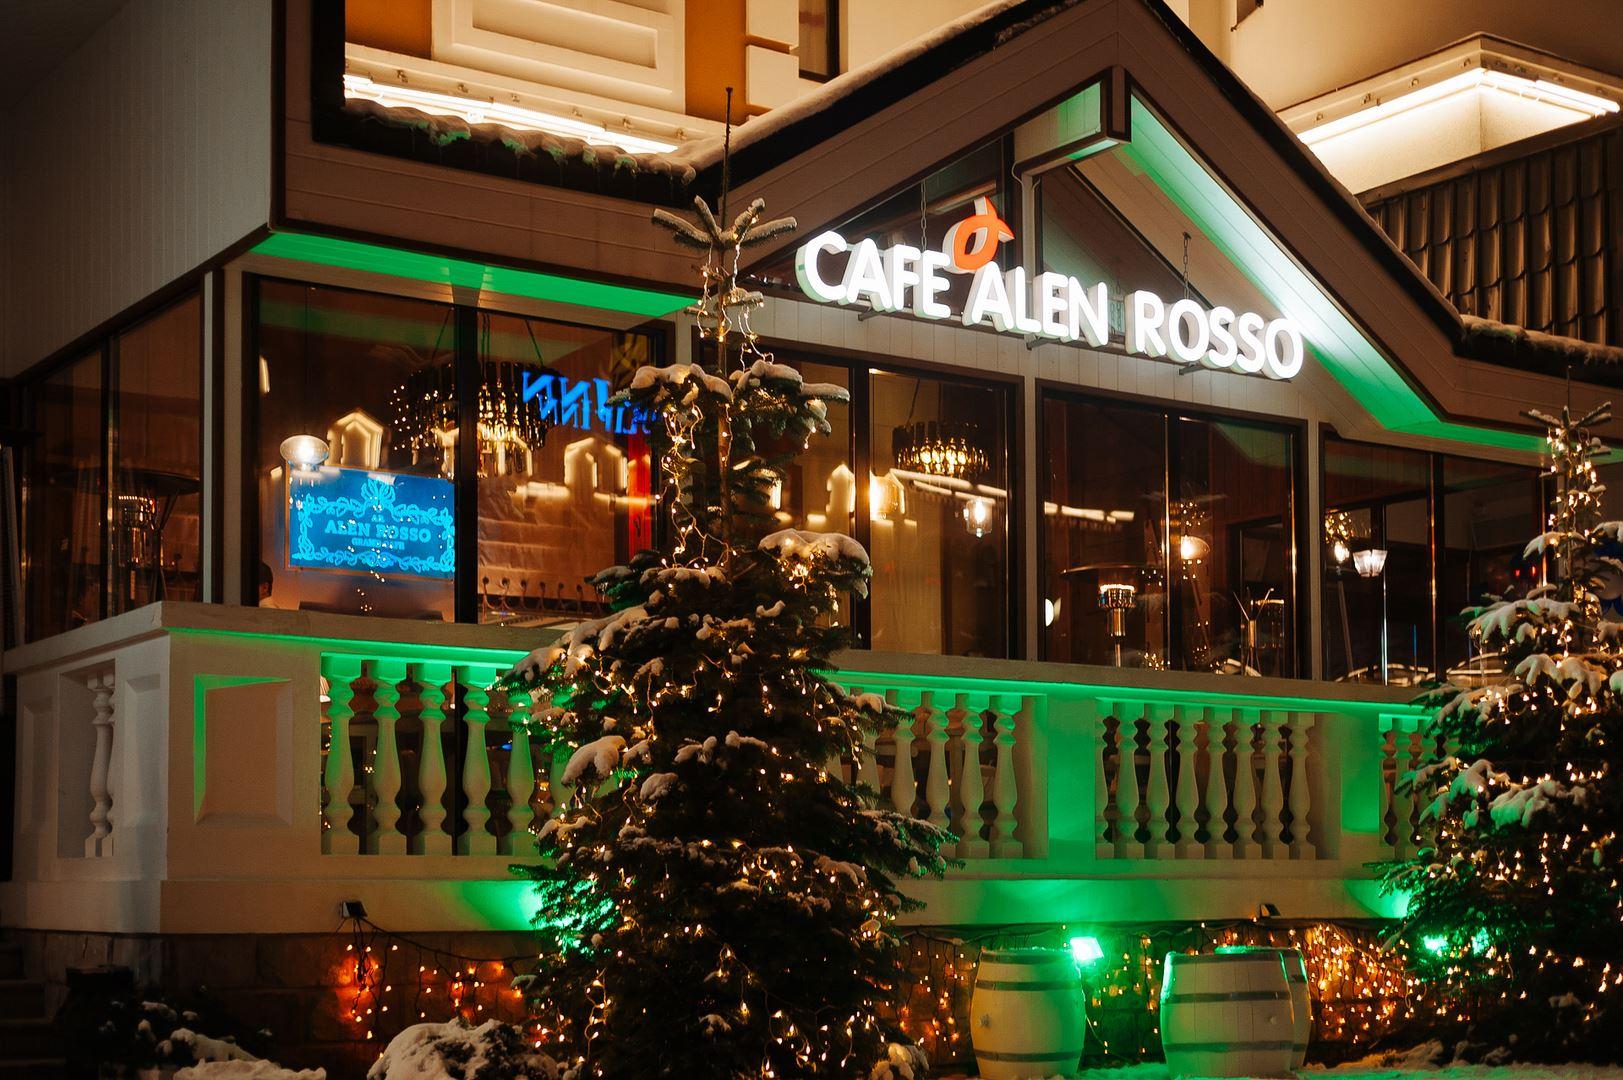 Гранд-кафе Alen Rosso